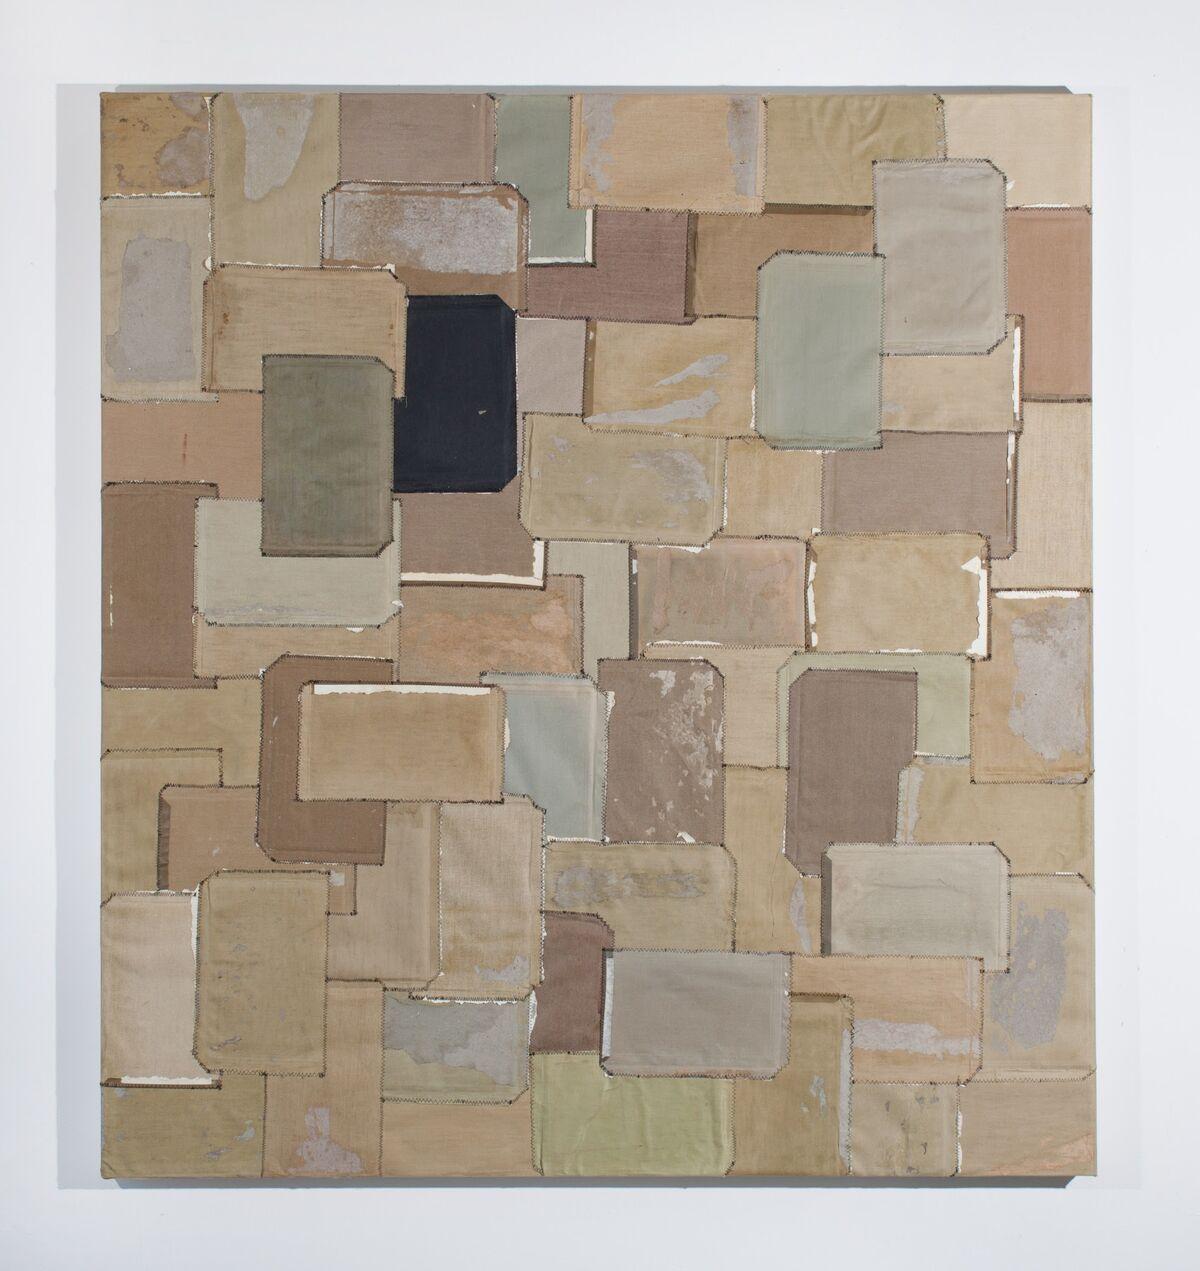 Samuel Levi Jones, Stephon Clark, 2018. Courtesy of the artist and Susanne Vielmetter Los Angeles Projects.